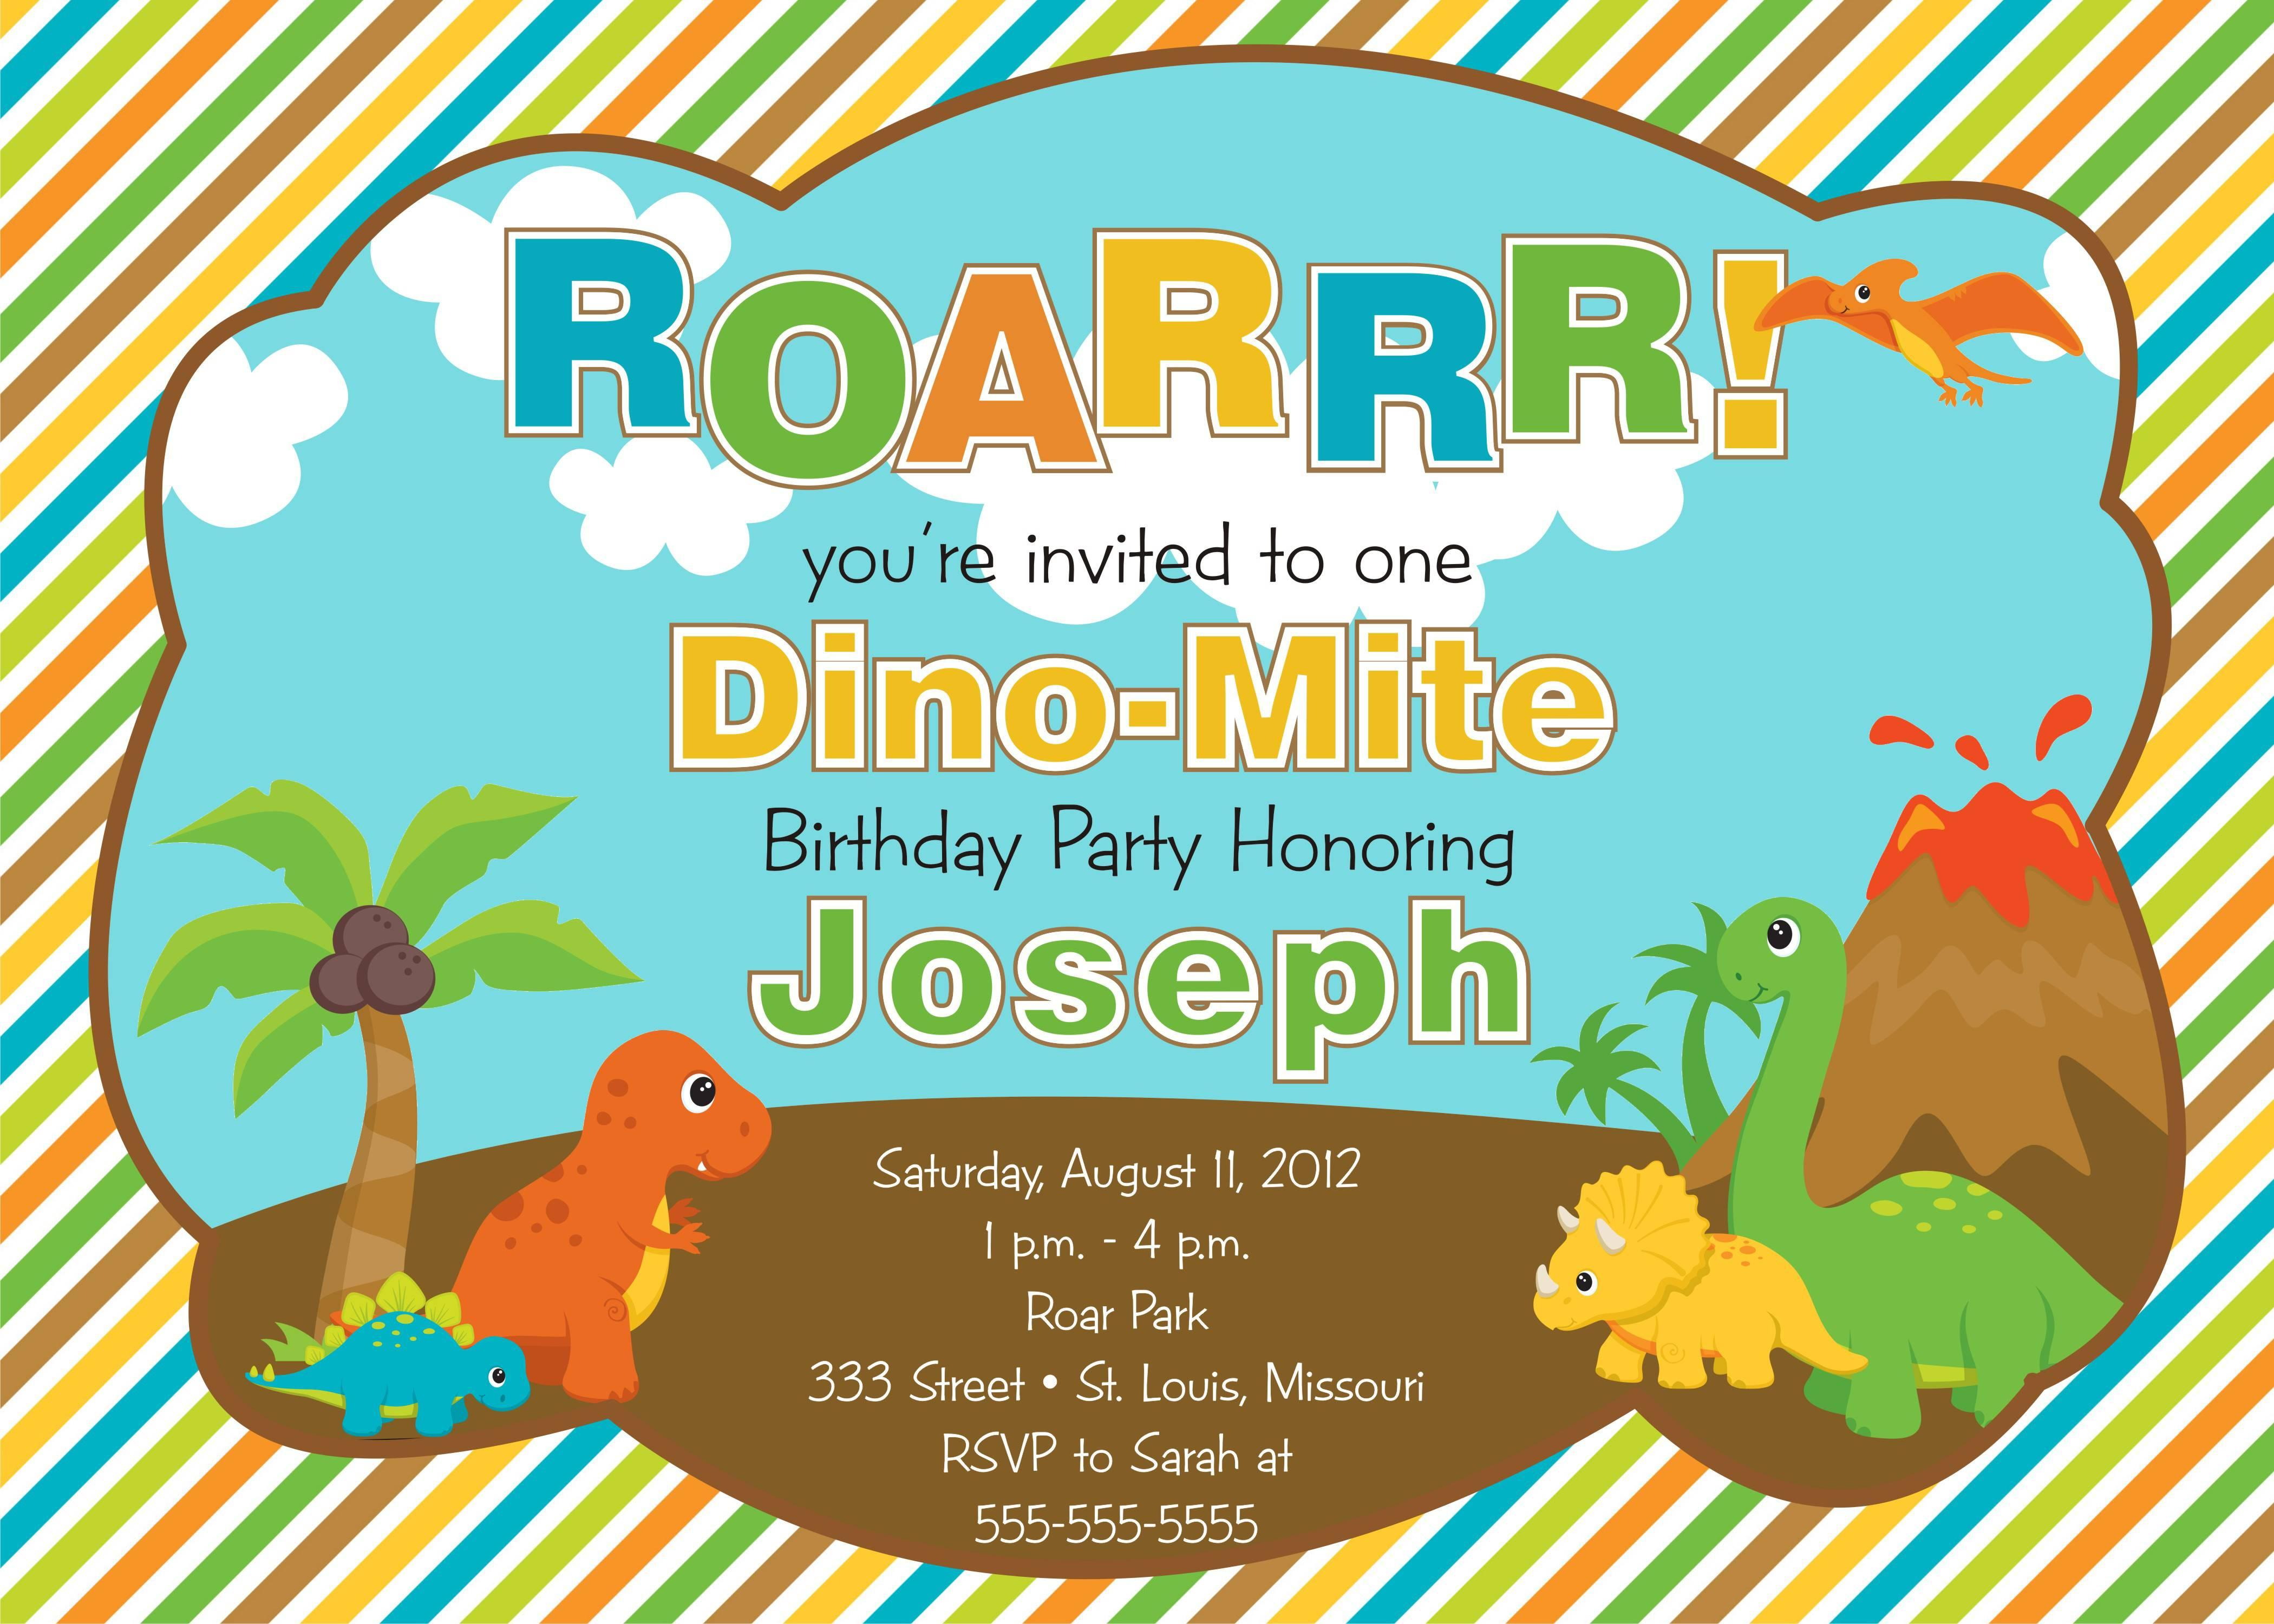 Dinosaur Party Invitations Template